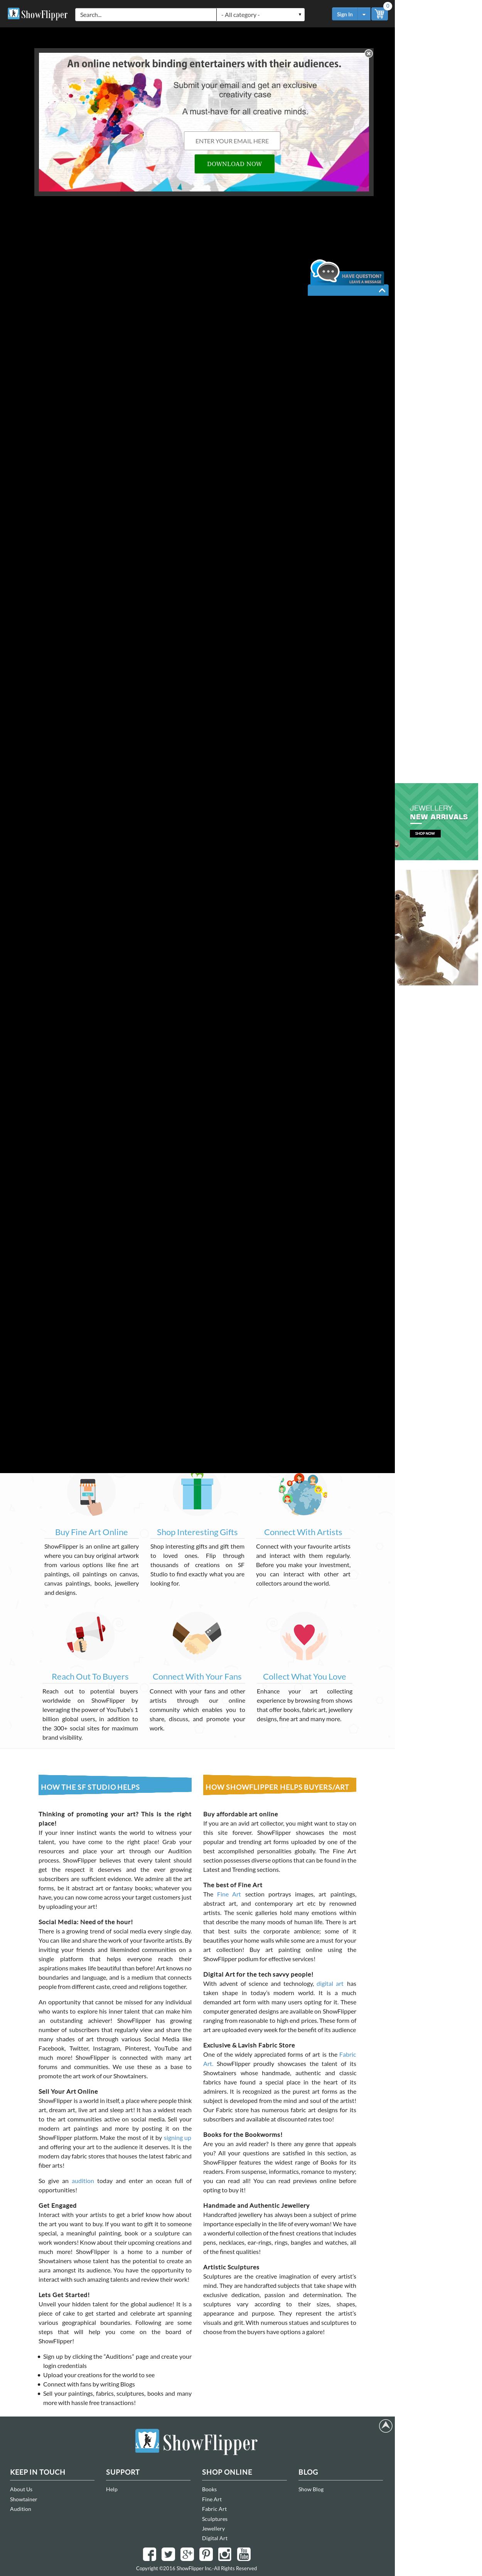 Showflipper Competitors, Revenue and Employees - Owler Company Profile